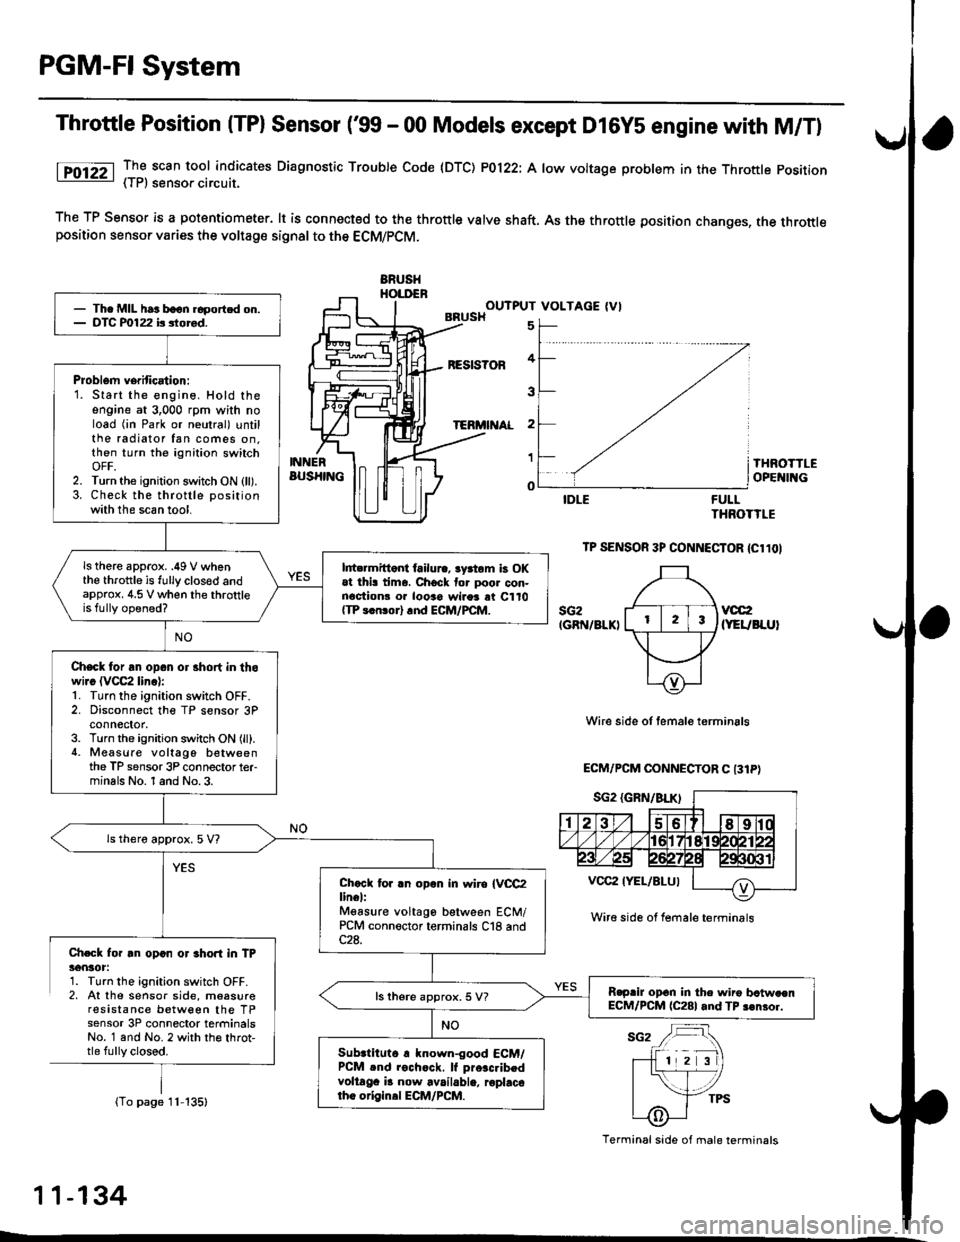 Check Engine Honda Civic 1997 6g Workshop Manual Primary Heated Oxygen Sensor Ho2ssensor 1 Heater Circuit Page 403